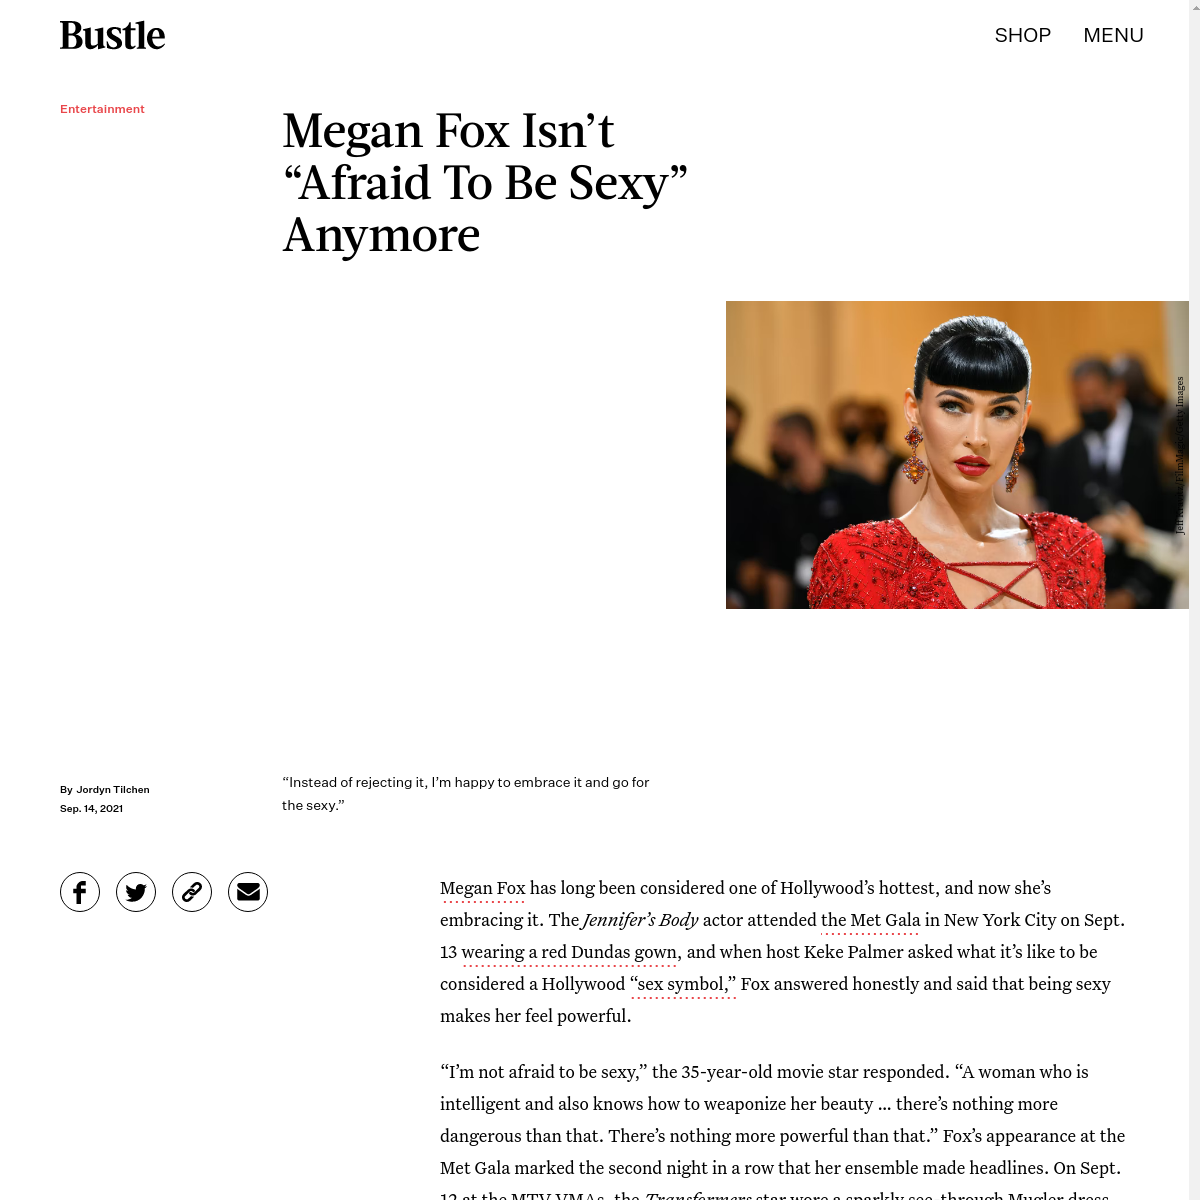 Megan Fox Met Gala